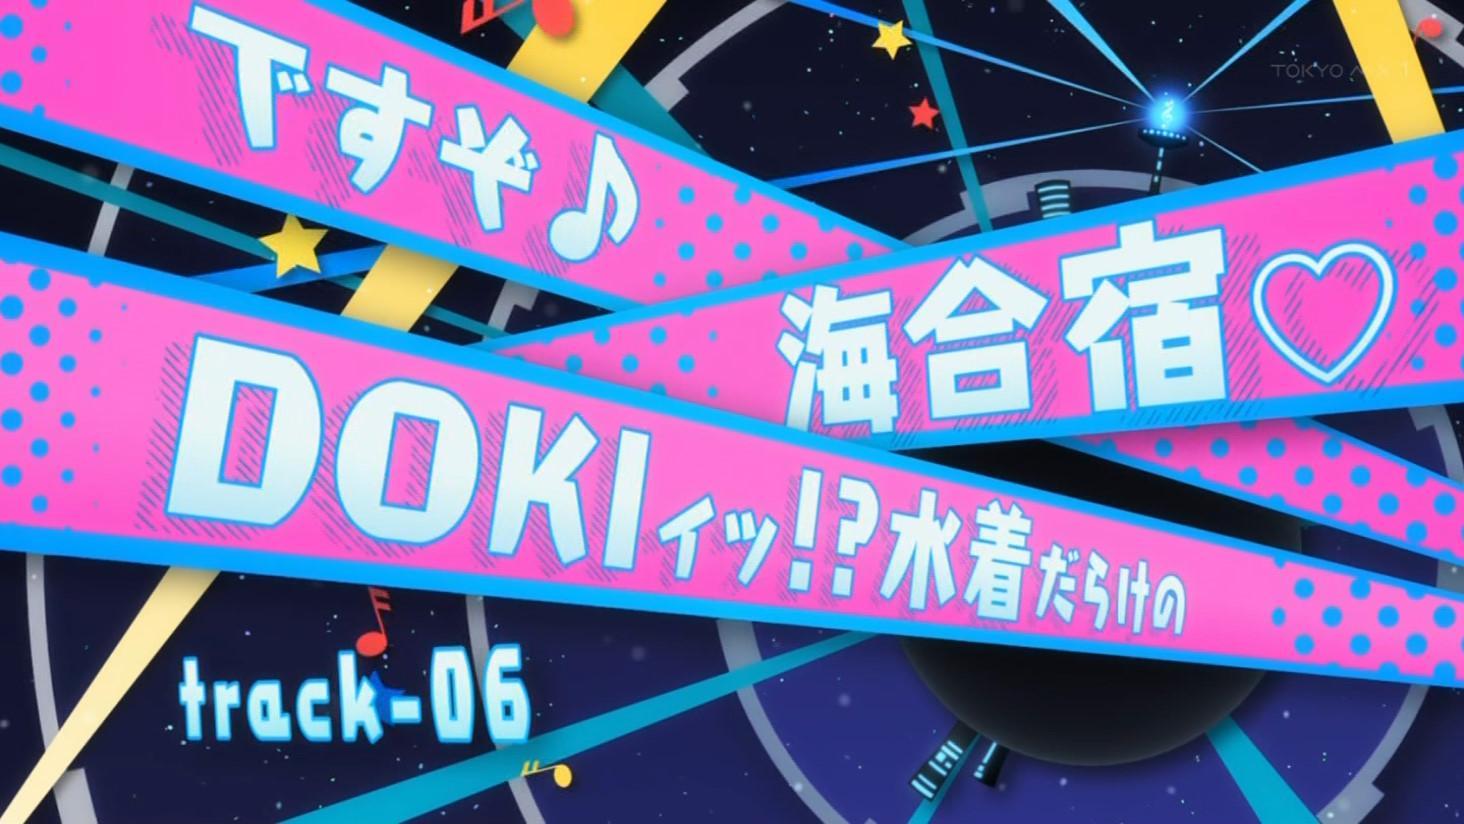 DOKIィッ!?水着だらけの海合宿♡ですぞ♪ #SB69A #tokyomx http://t.co/2mQQewFyUU